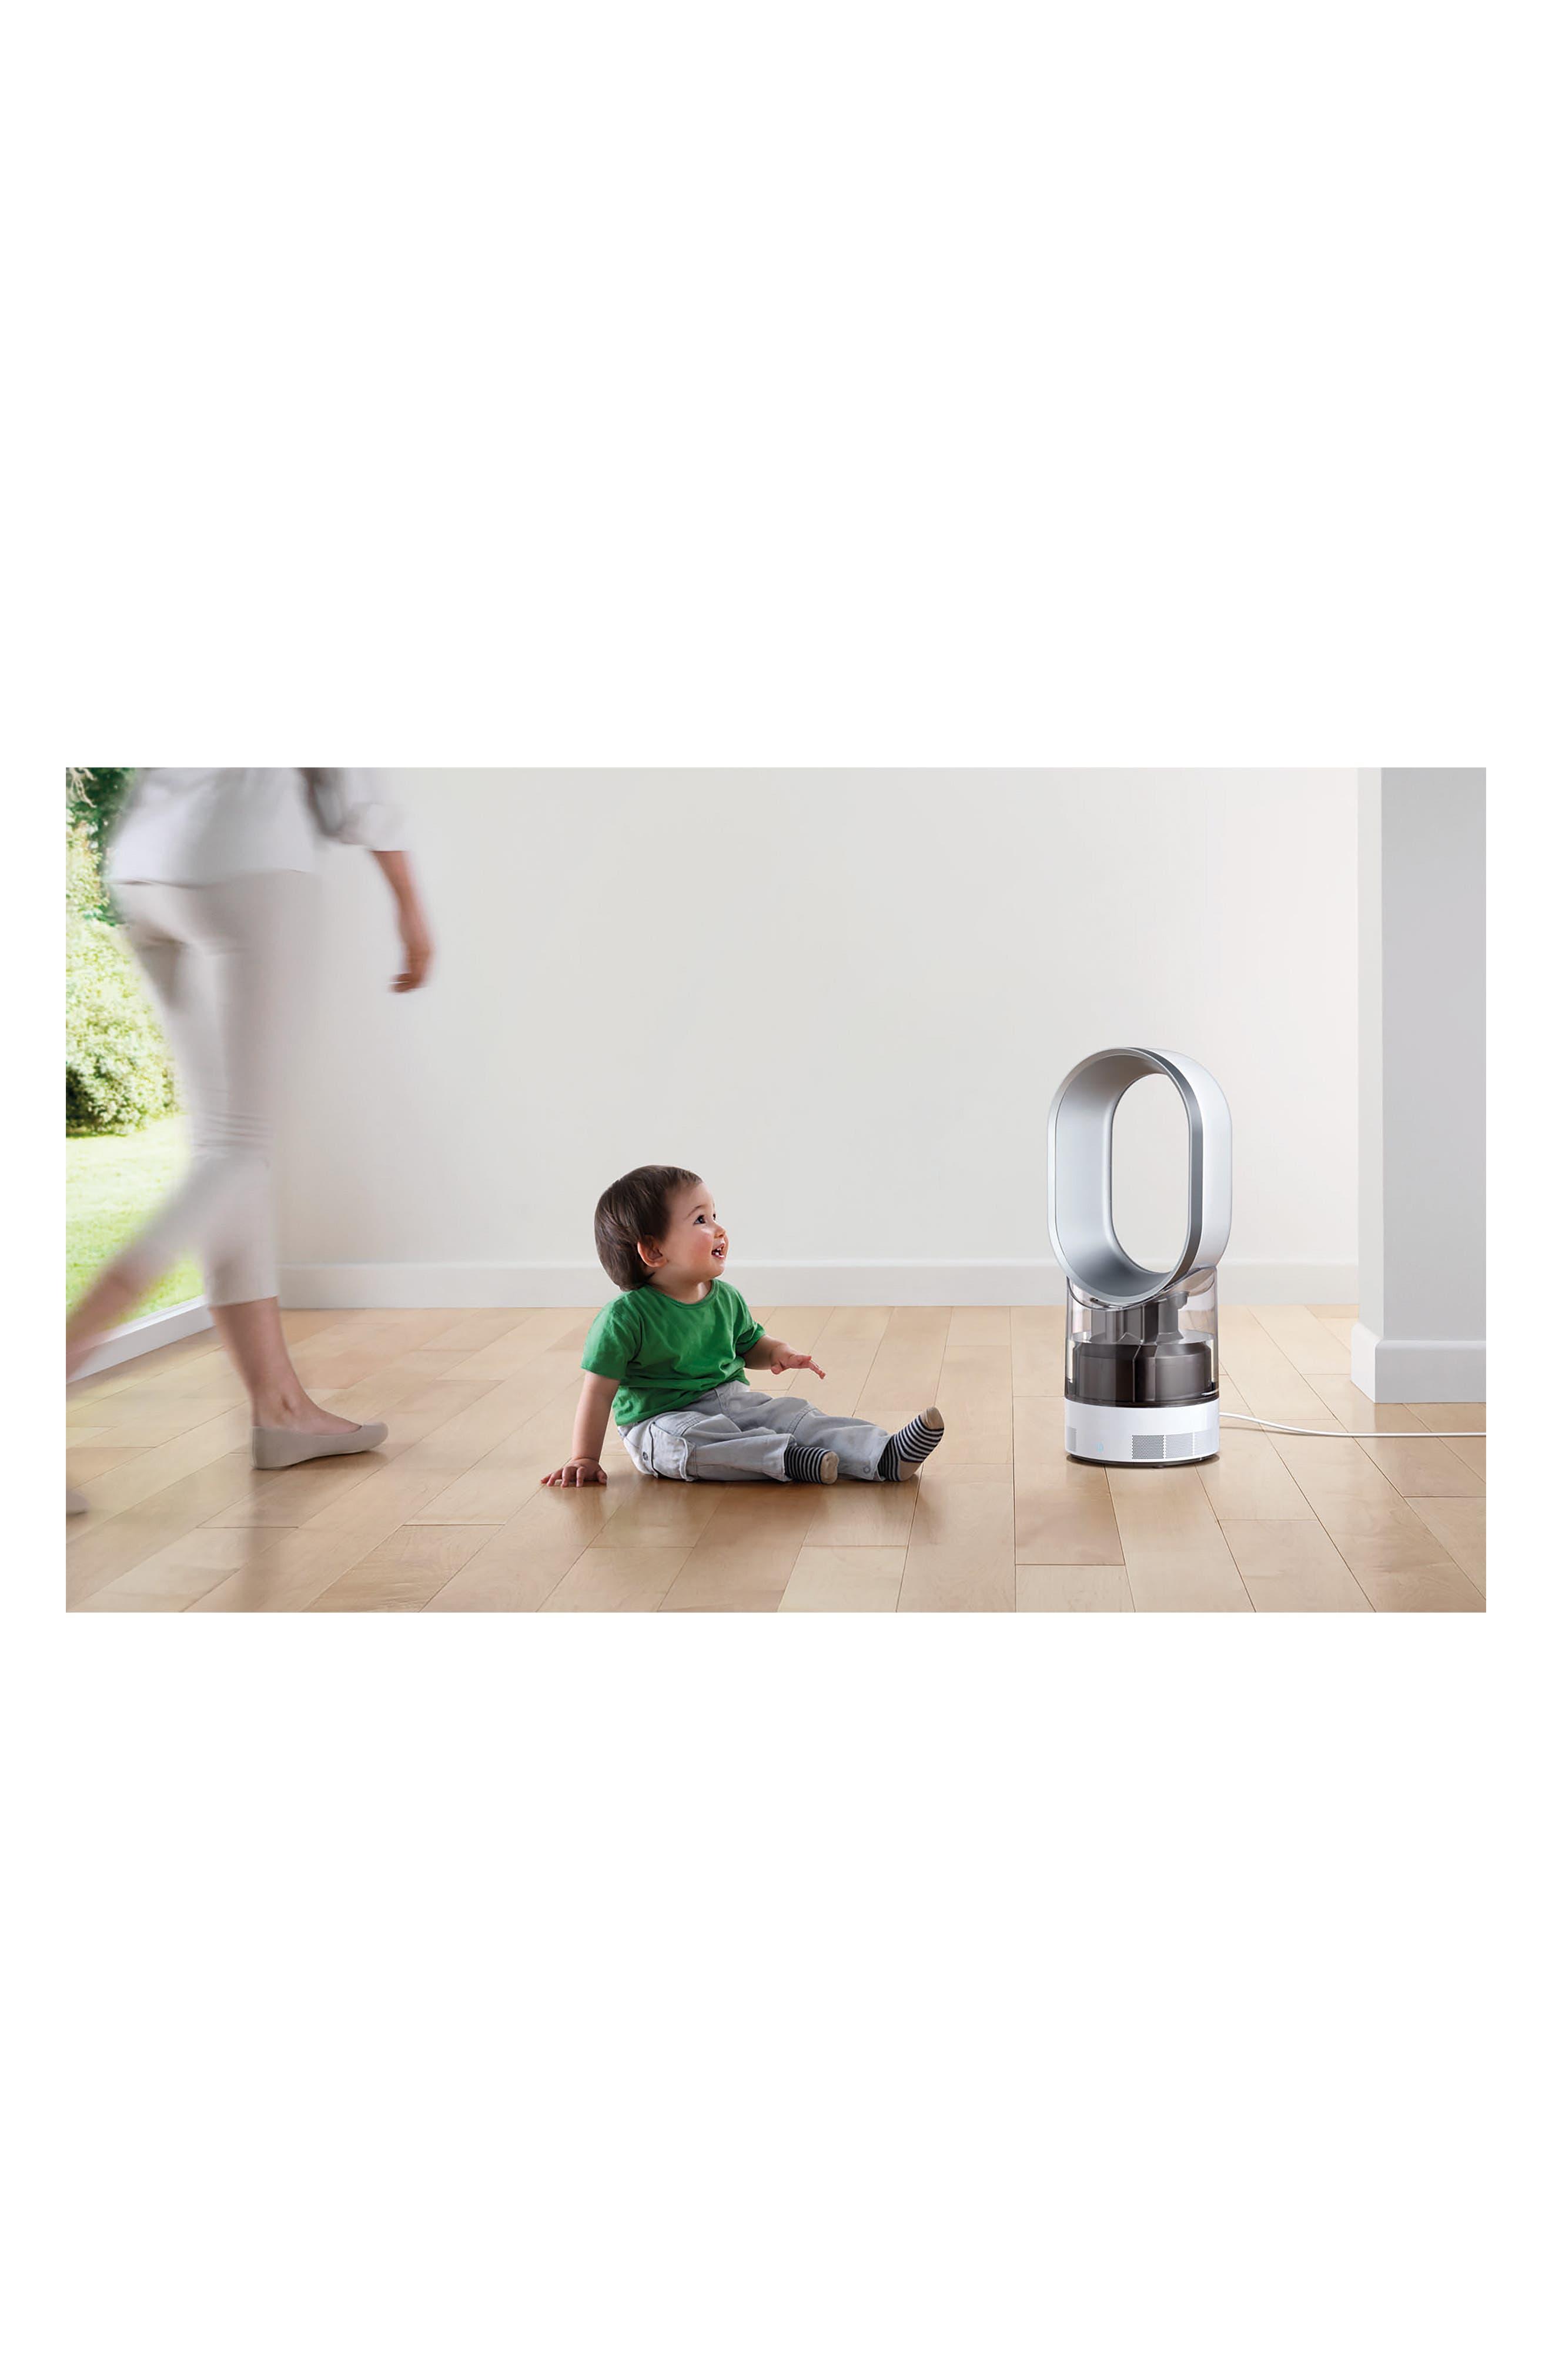 AM10 Hygienic Humidifier & Bladeless Fan,                             Alternate thumbnail 2, color,